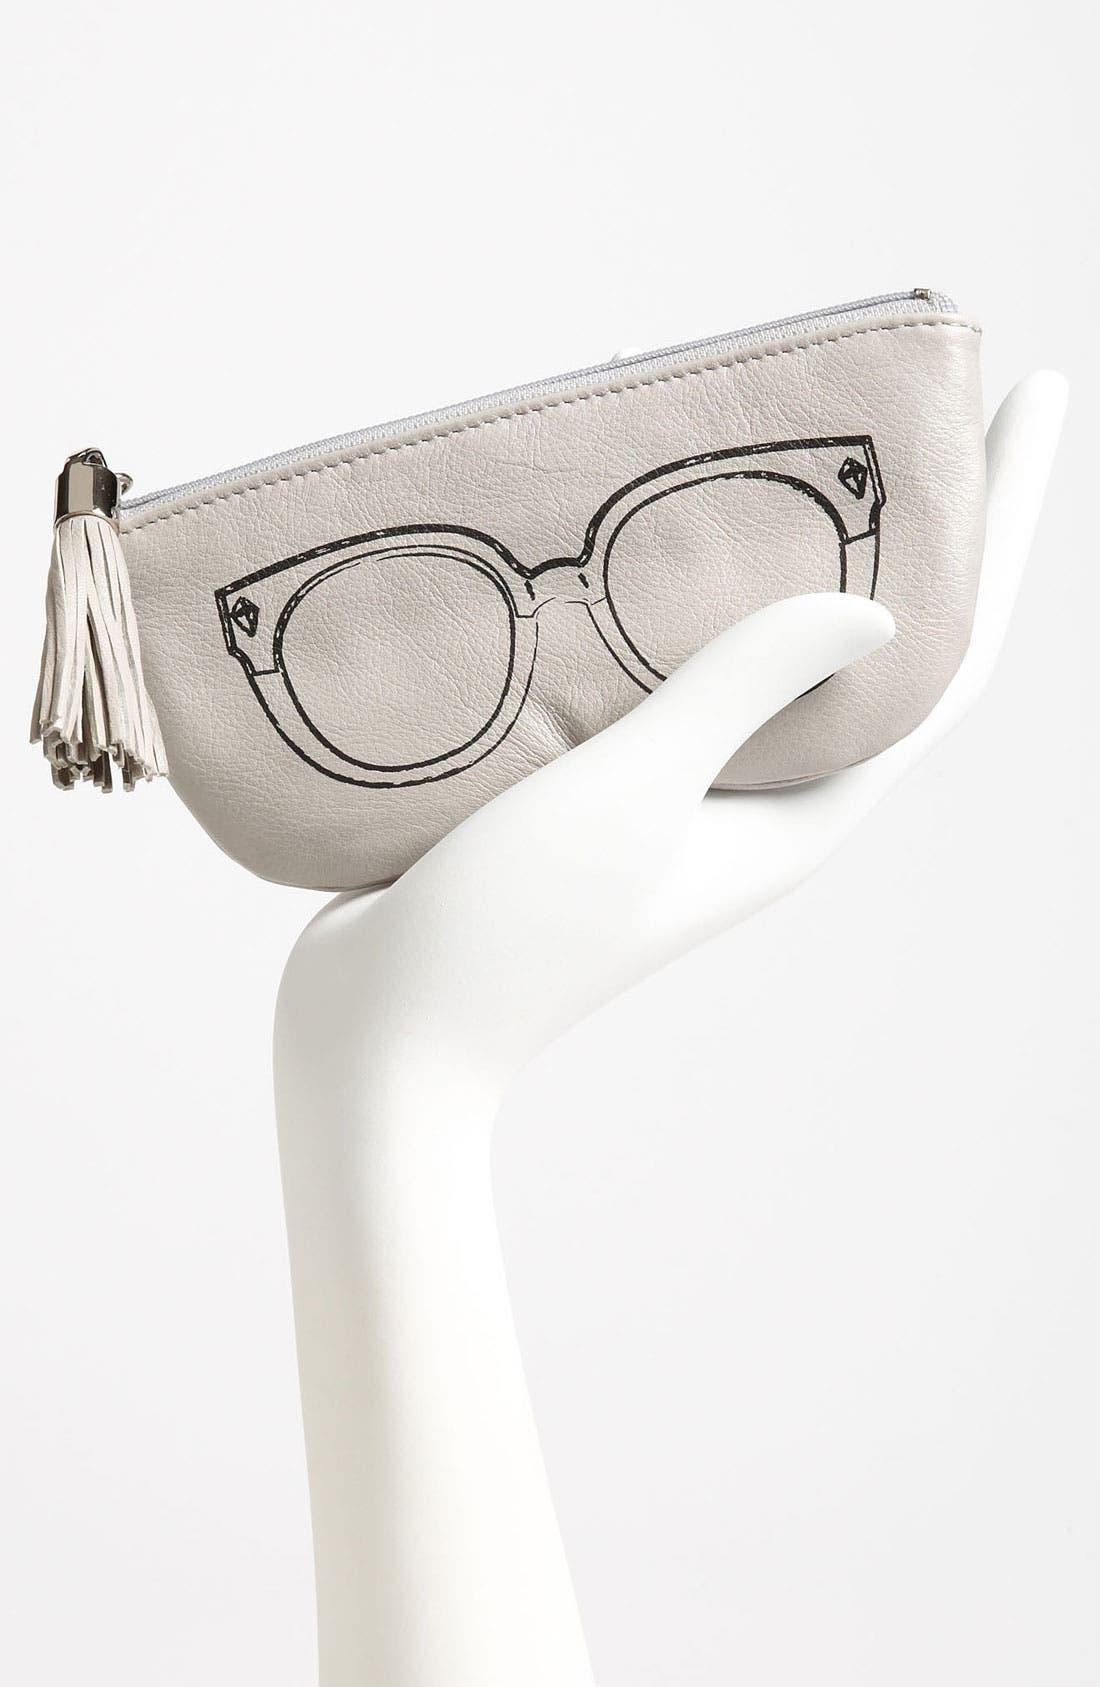 REBECCA MINKOFF, Leather Sunglasses Case, Alternate thumbnail 3, color, 020